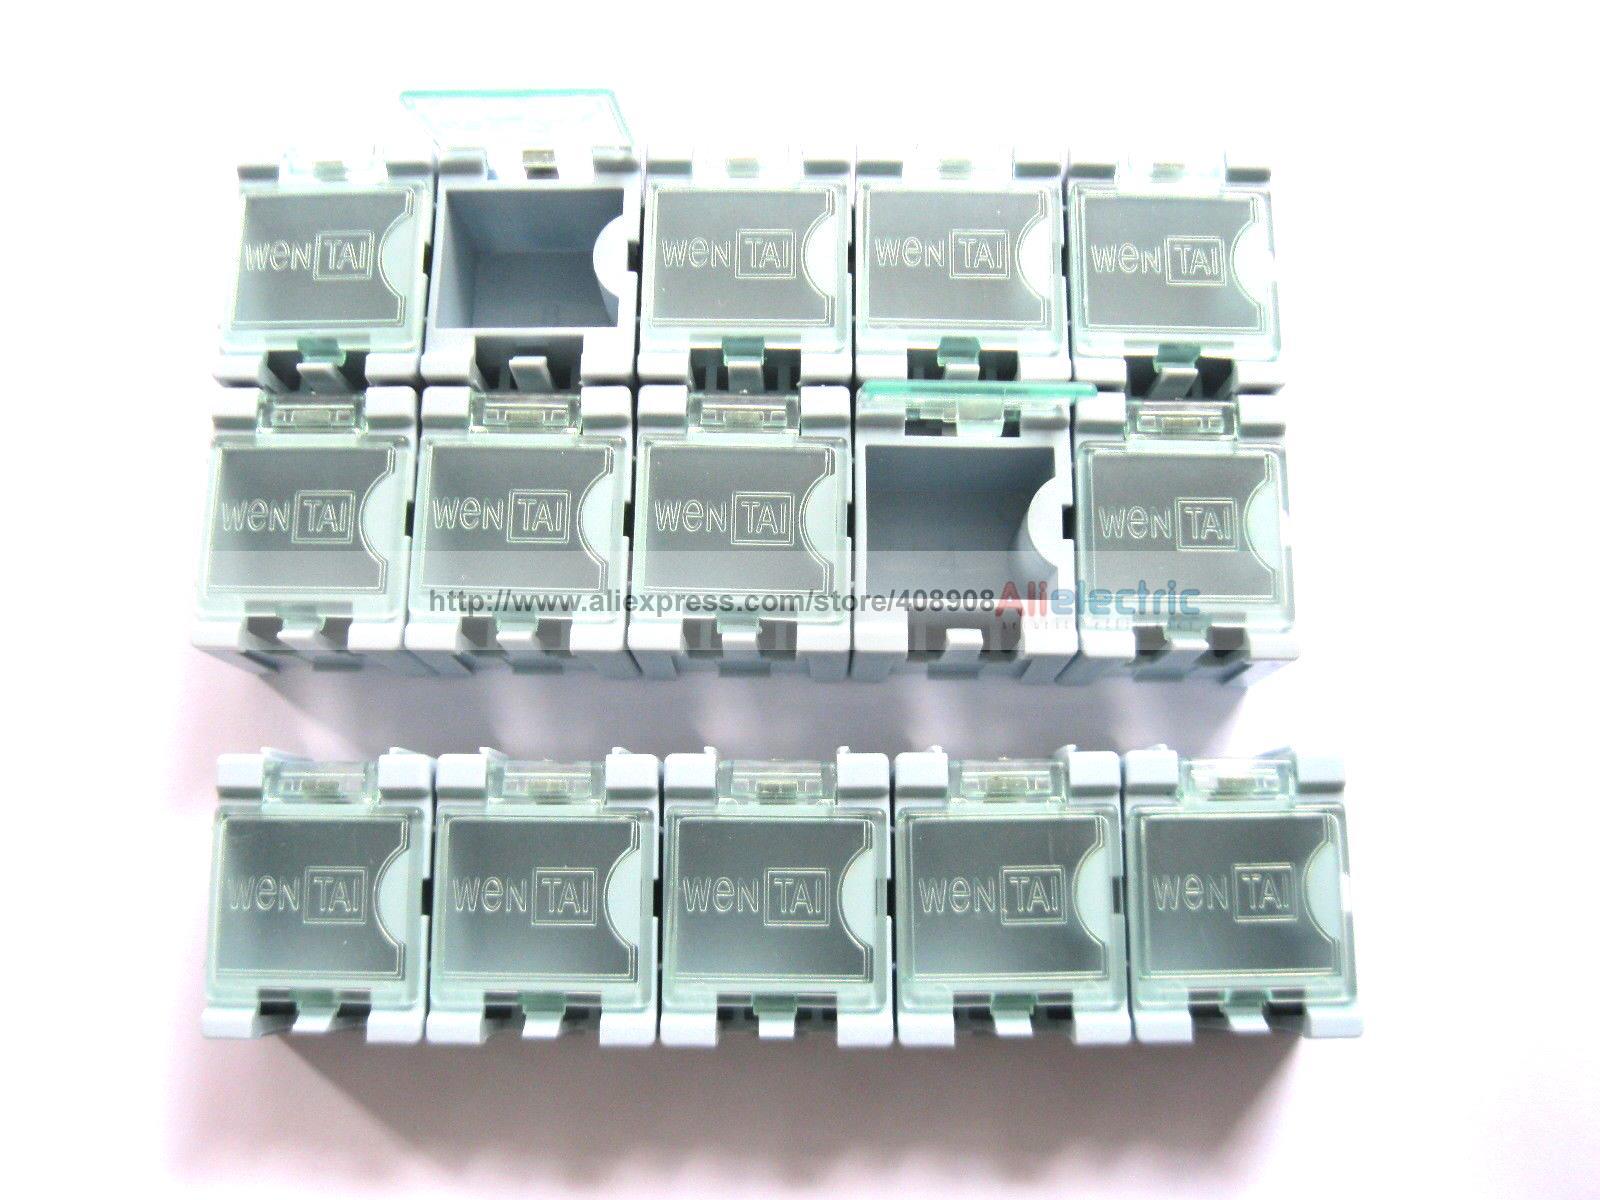 100 x Blue SMD Electronic Component Mini Storage Box